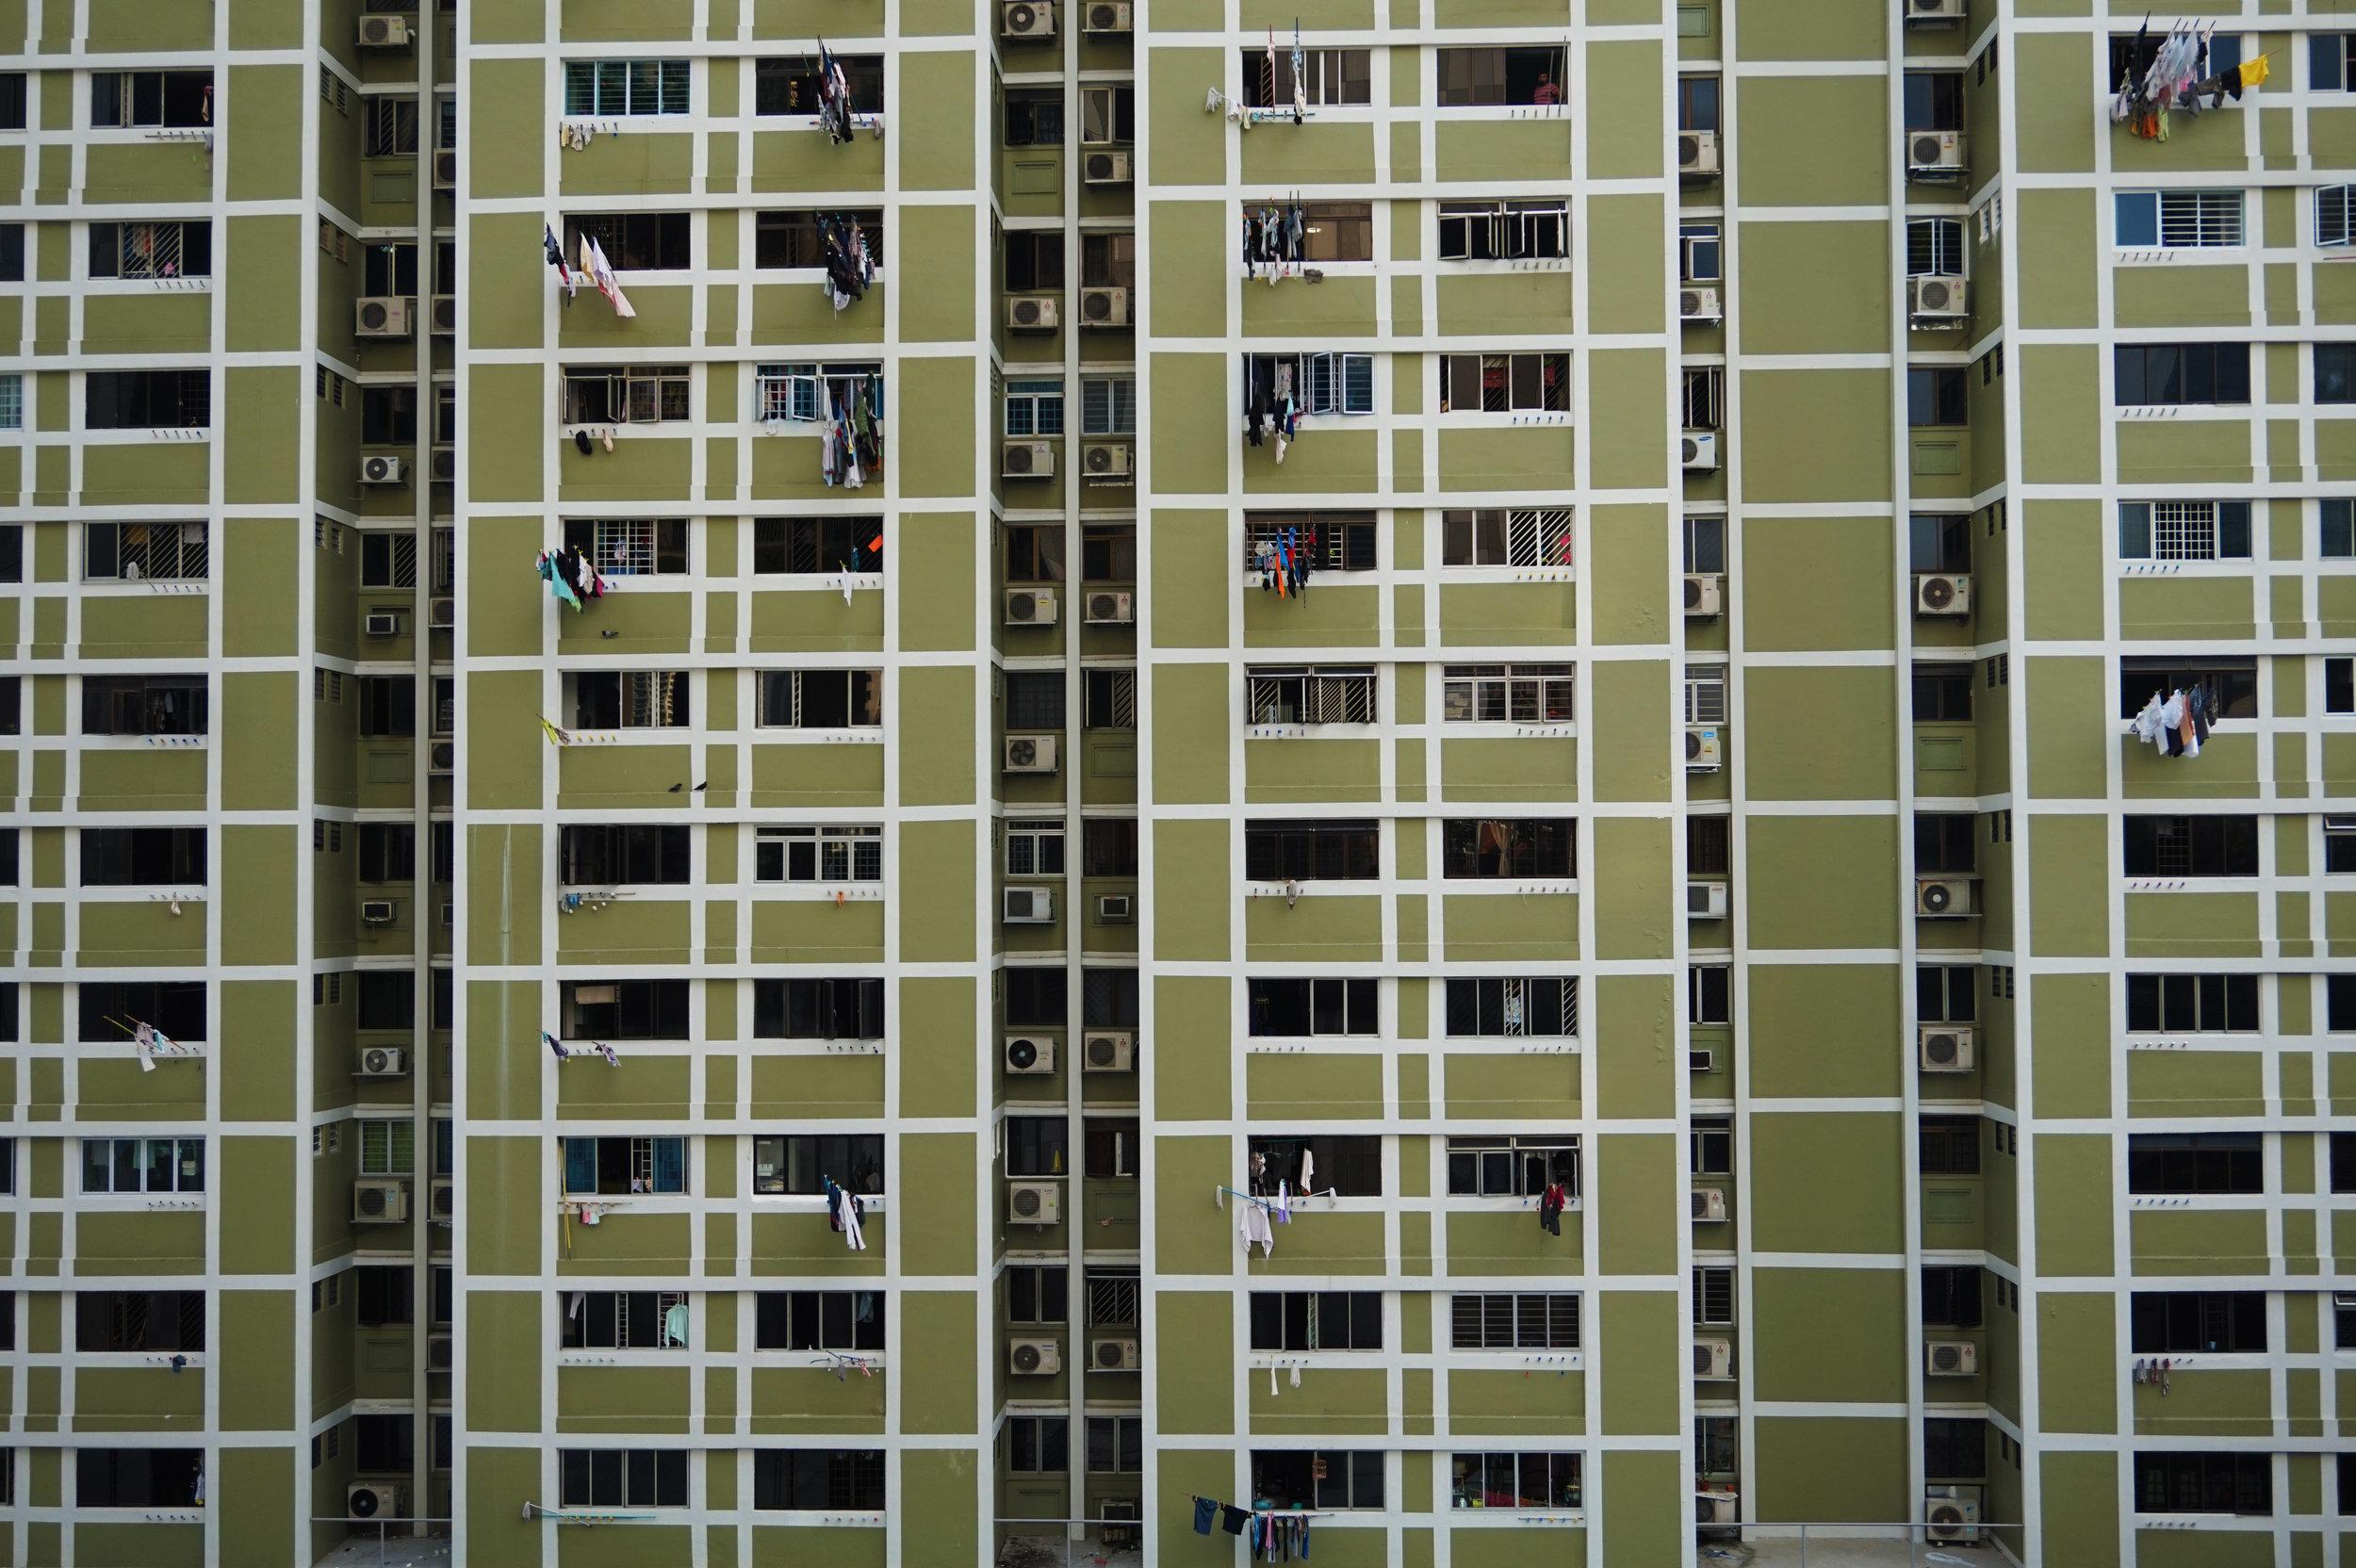 The beautiful uniformity of HDB flats